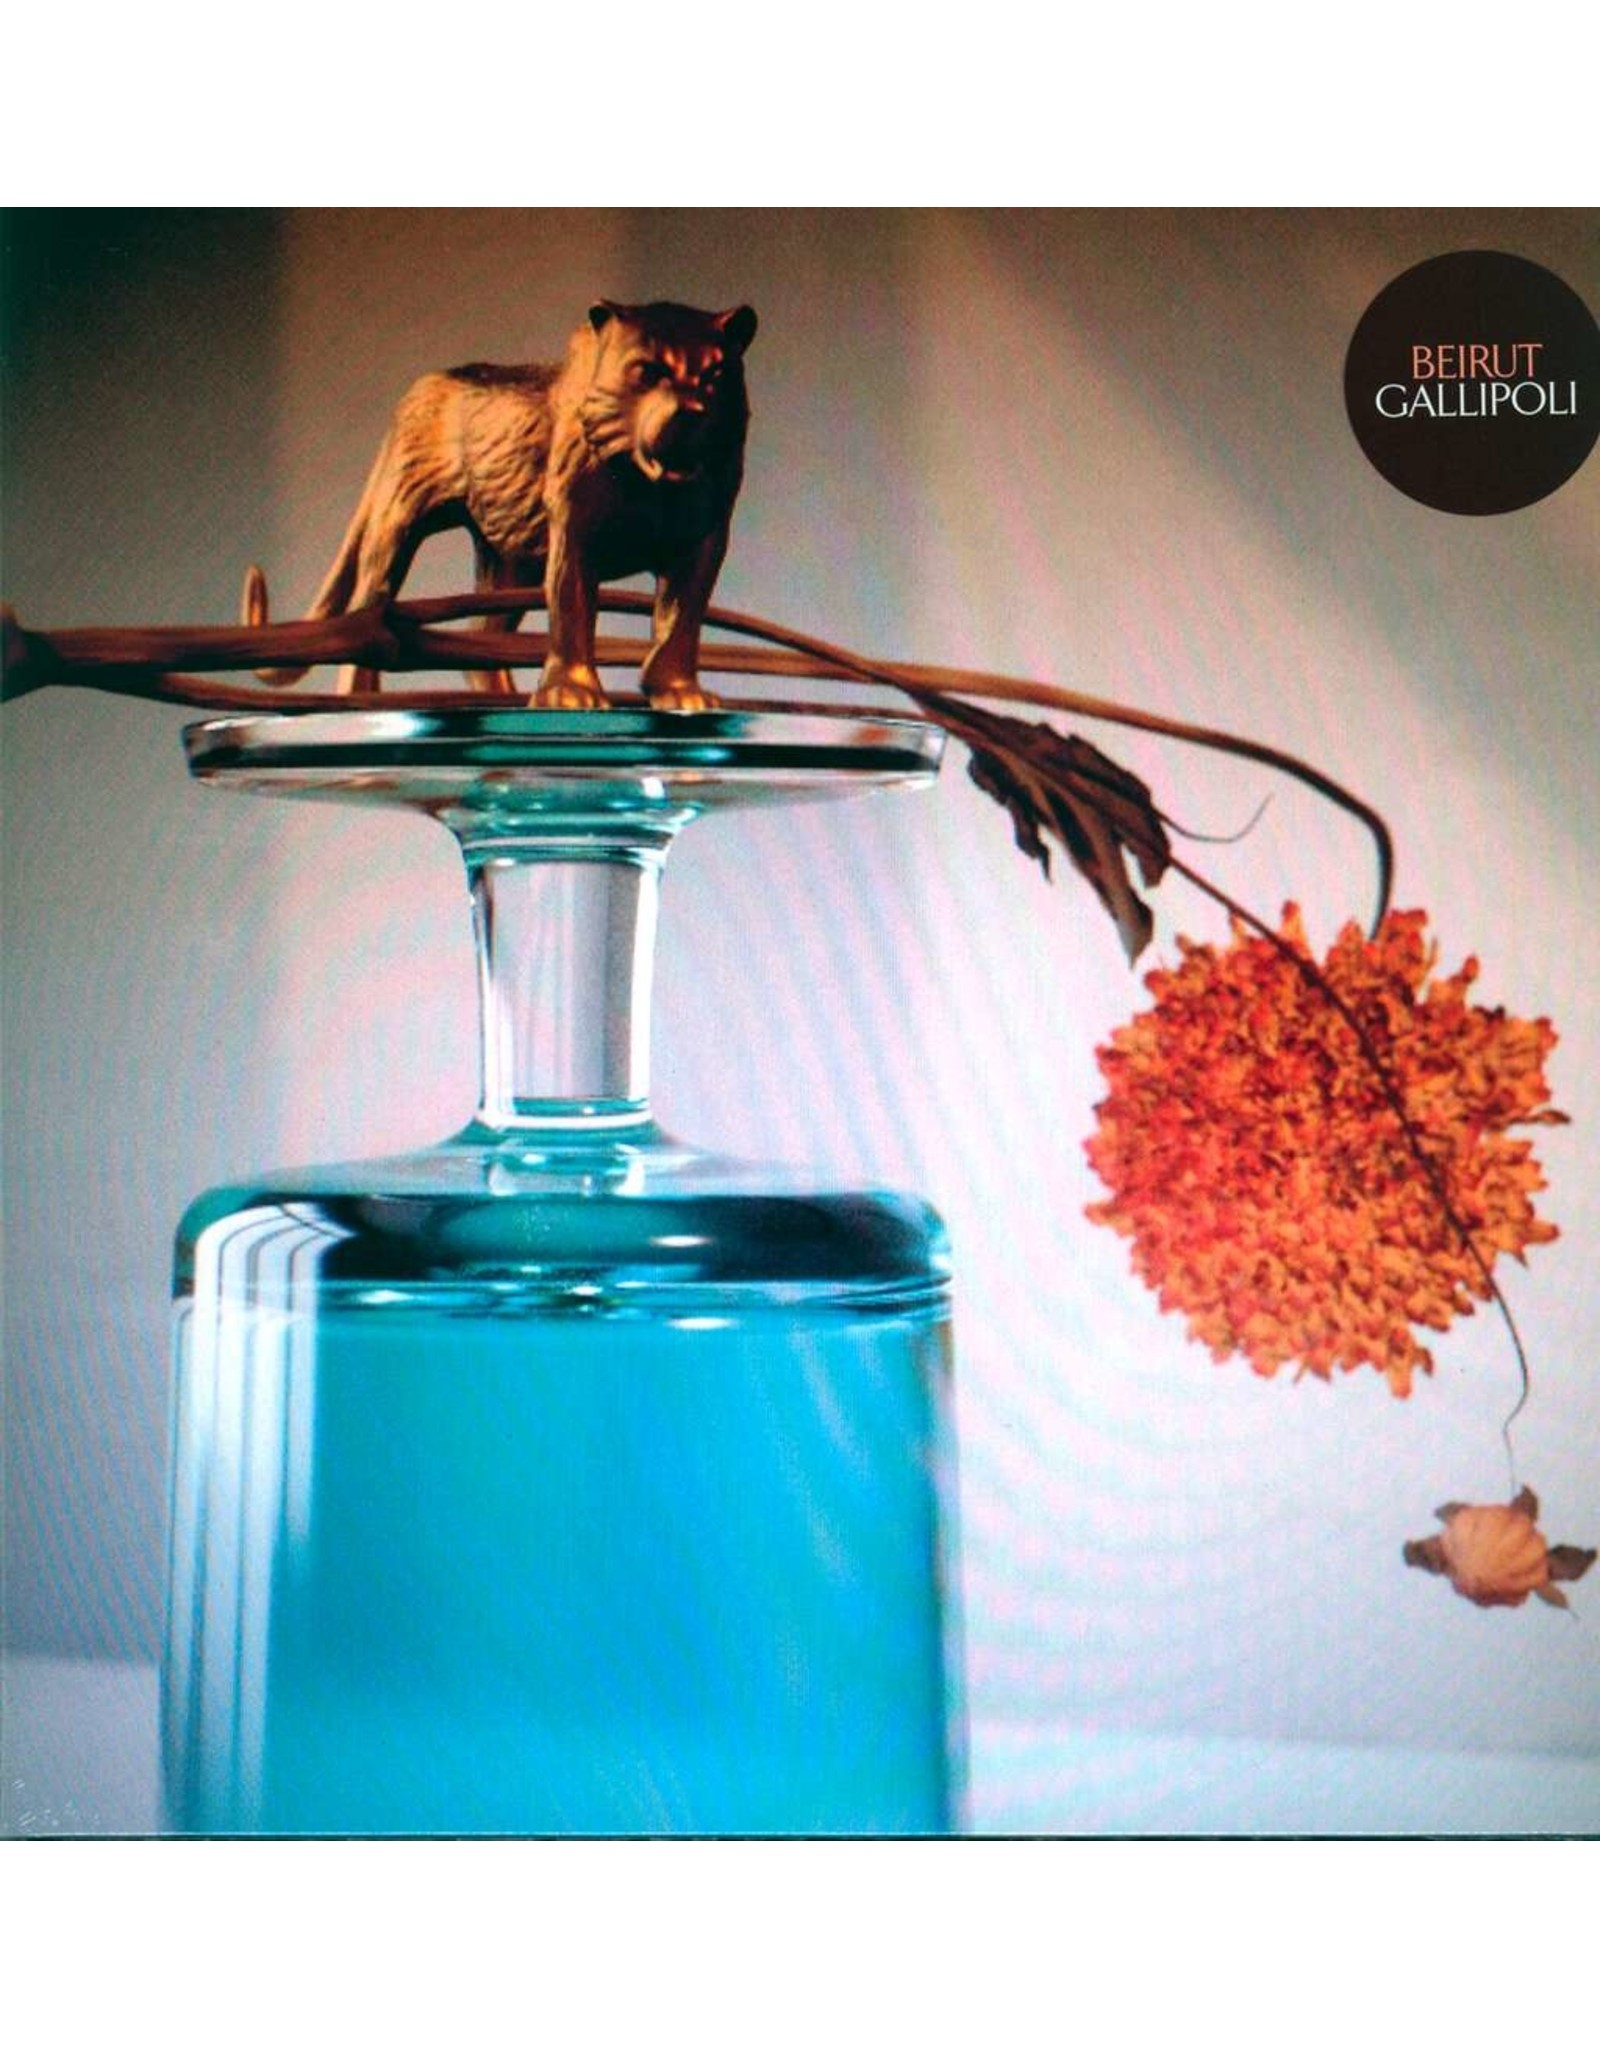 Beirut - Gallipoli (Green Vinyl)